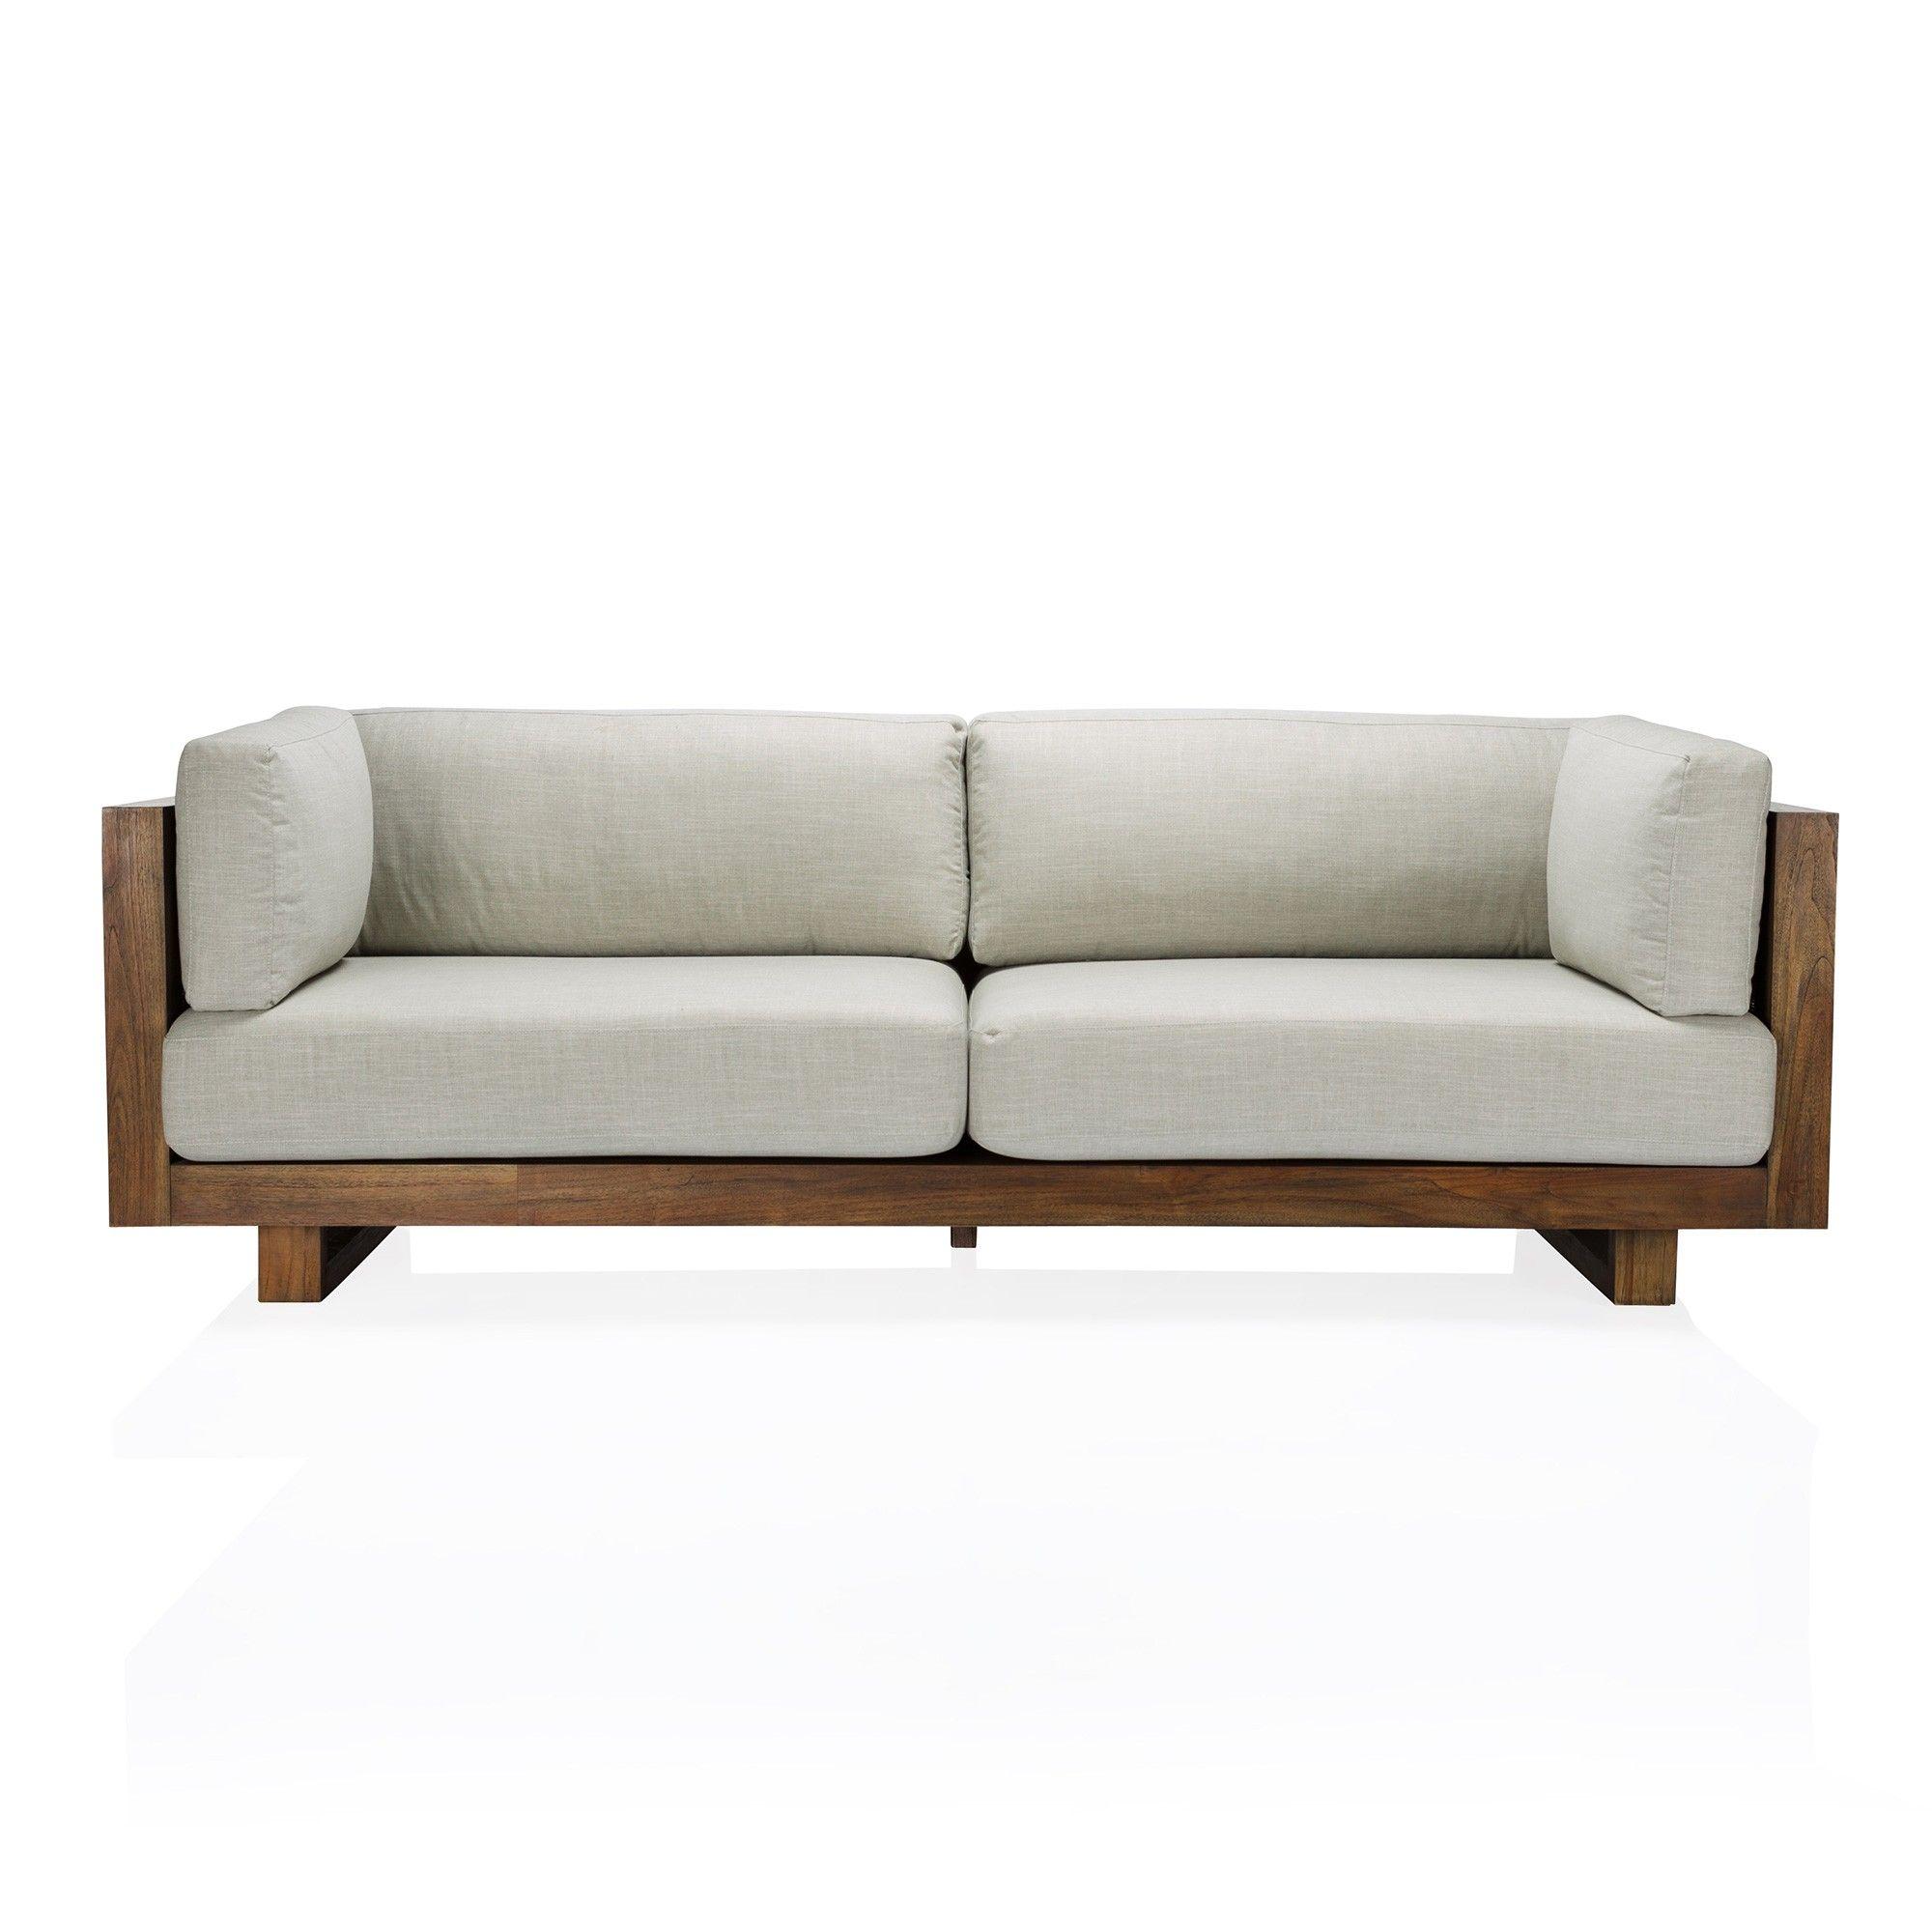 Toledo Sofa Oh Wholly Thank You Coco Republic